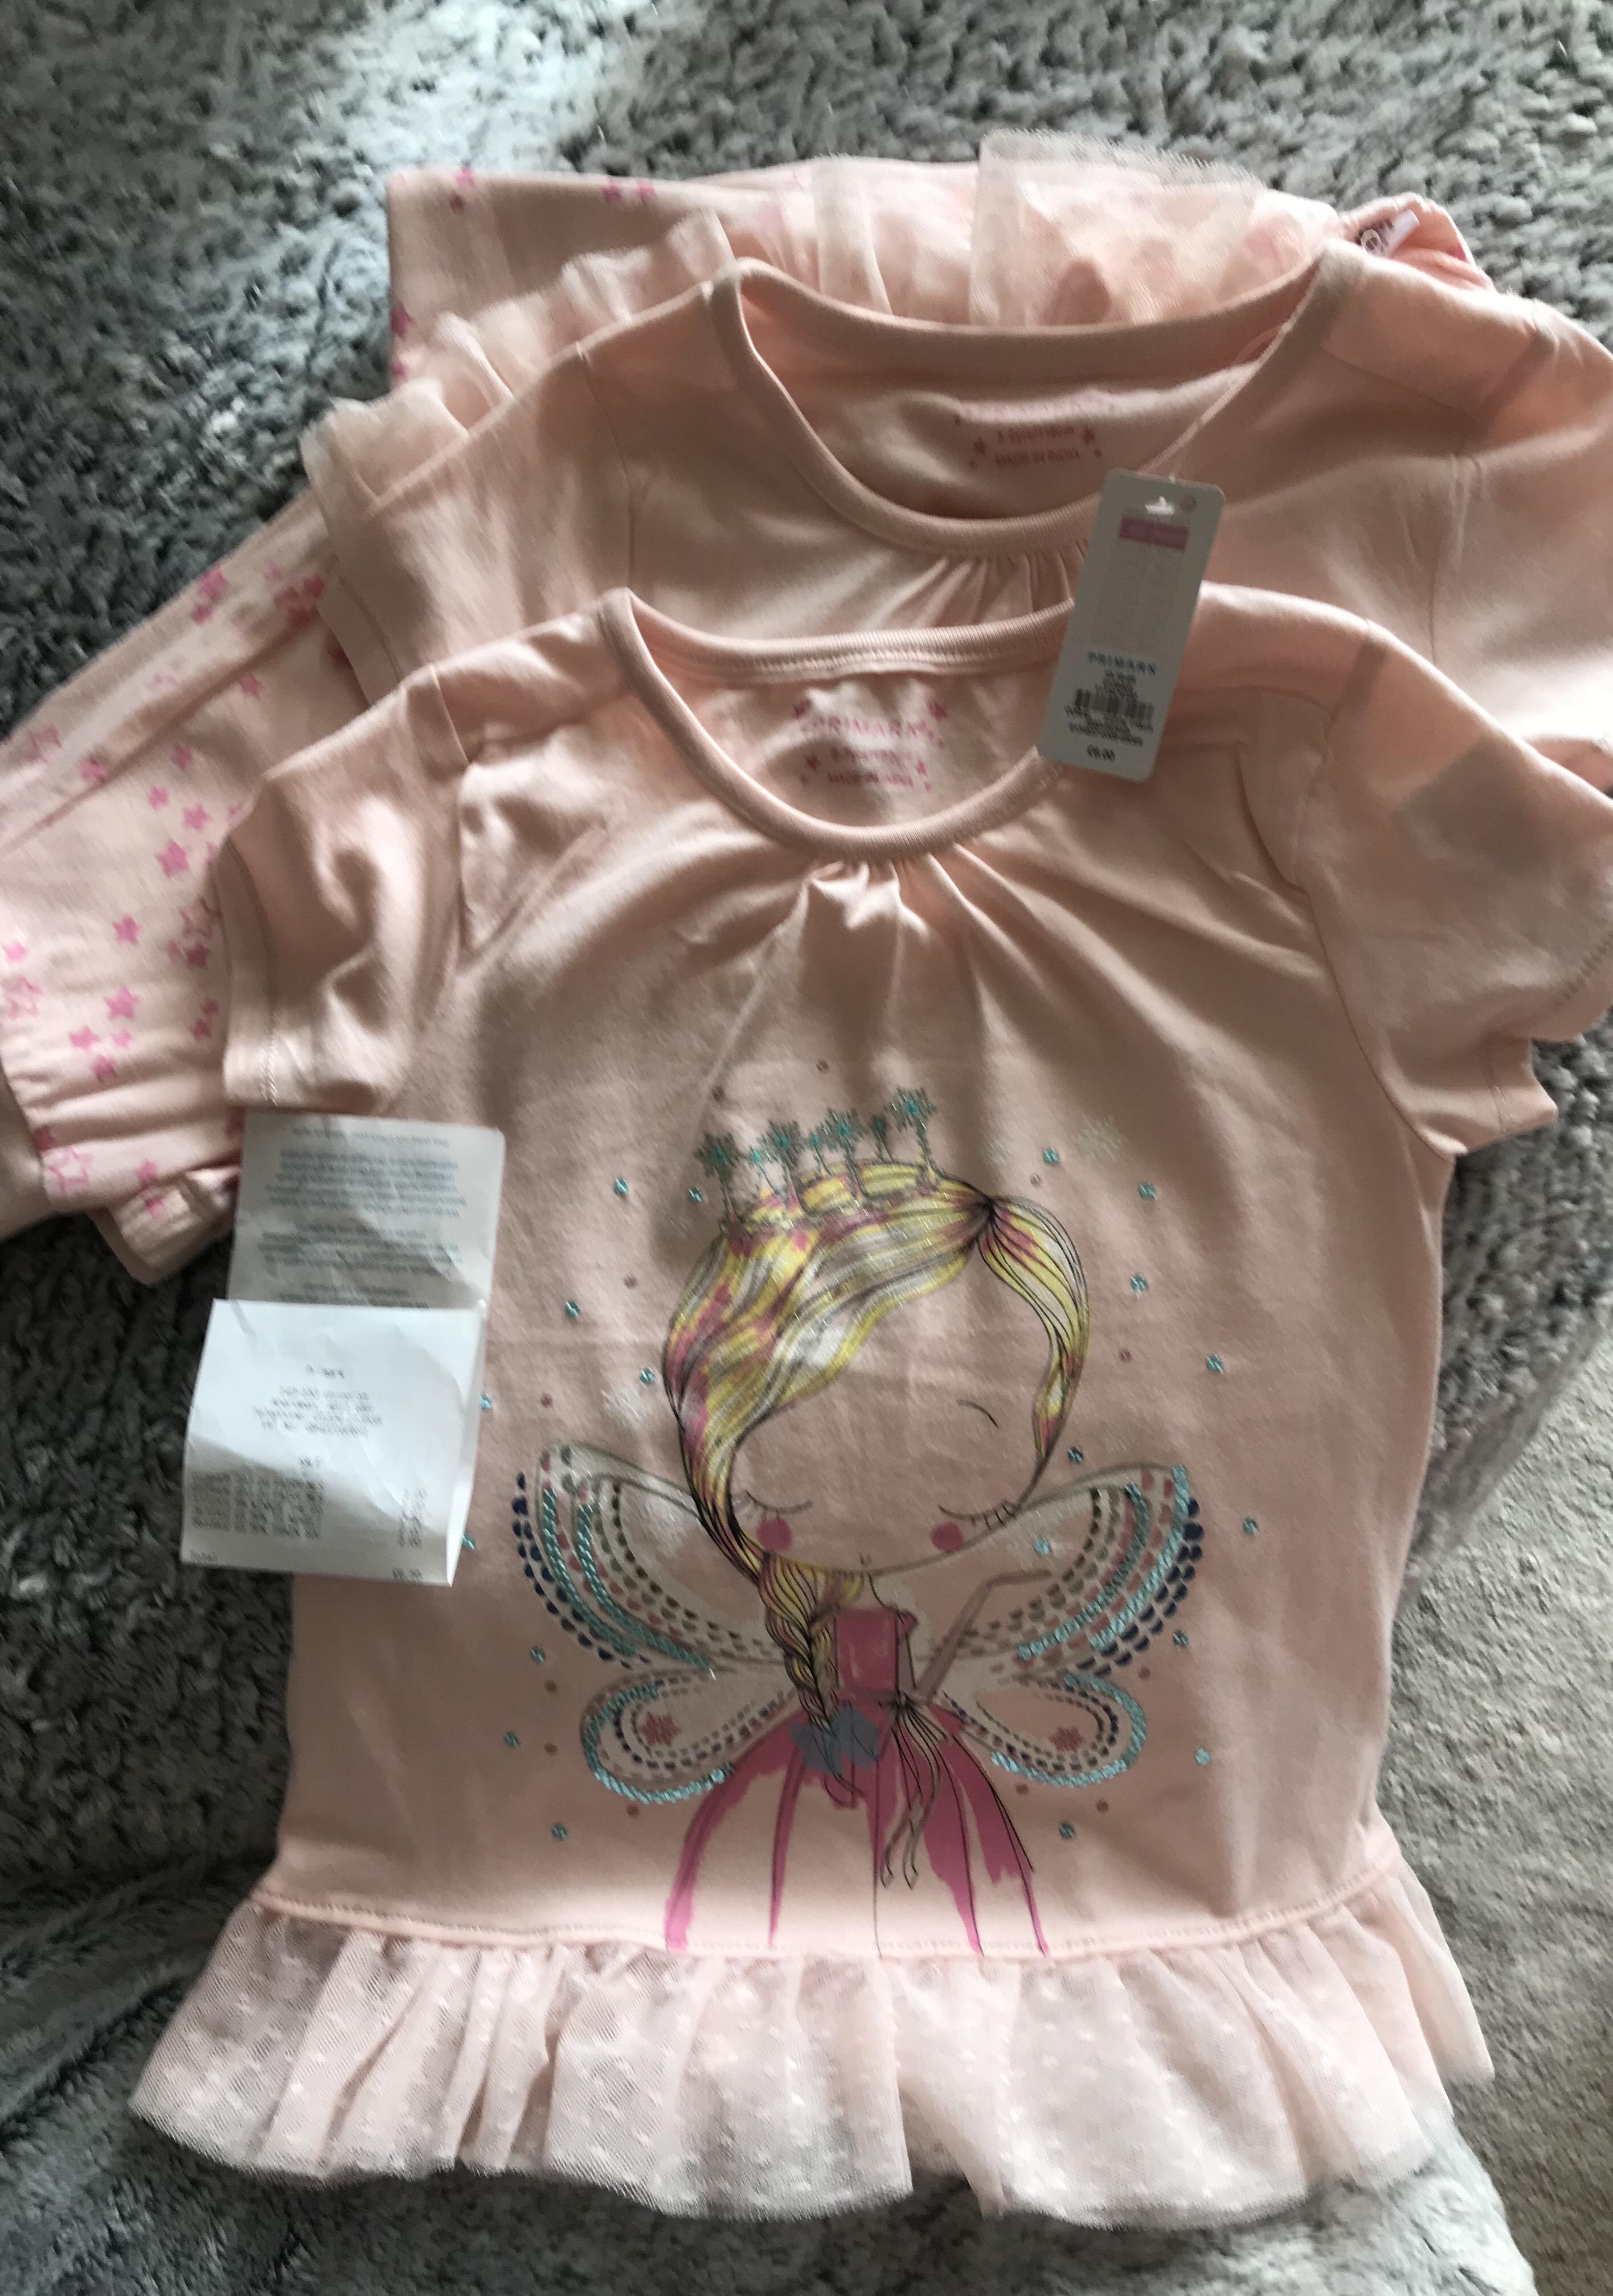 Primark girls pyjamas, £1 from £6 in store Aberdeen